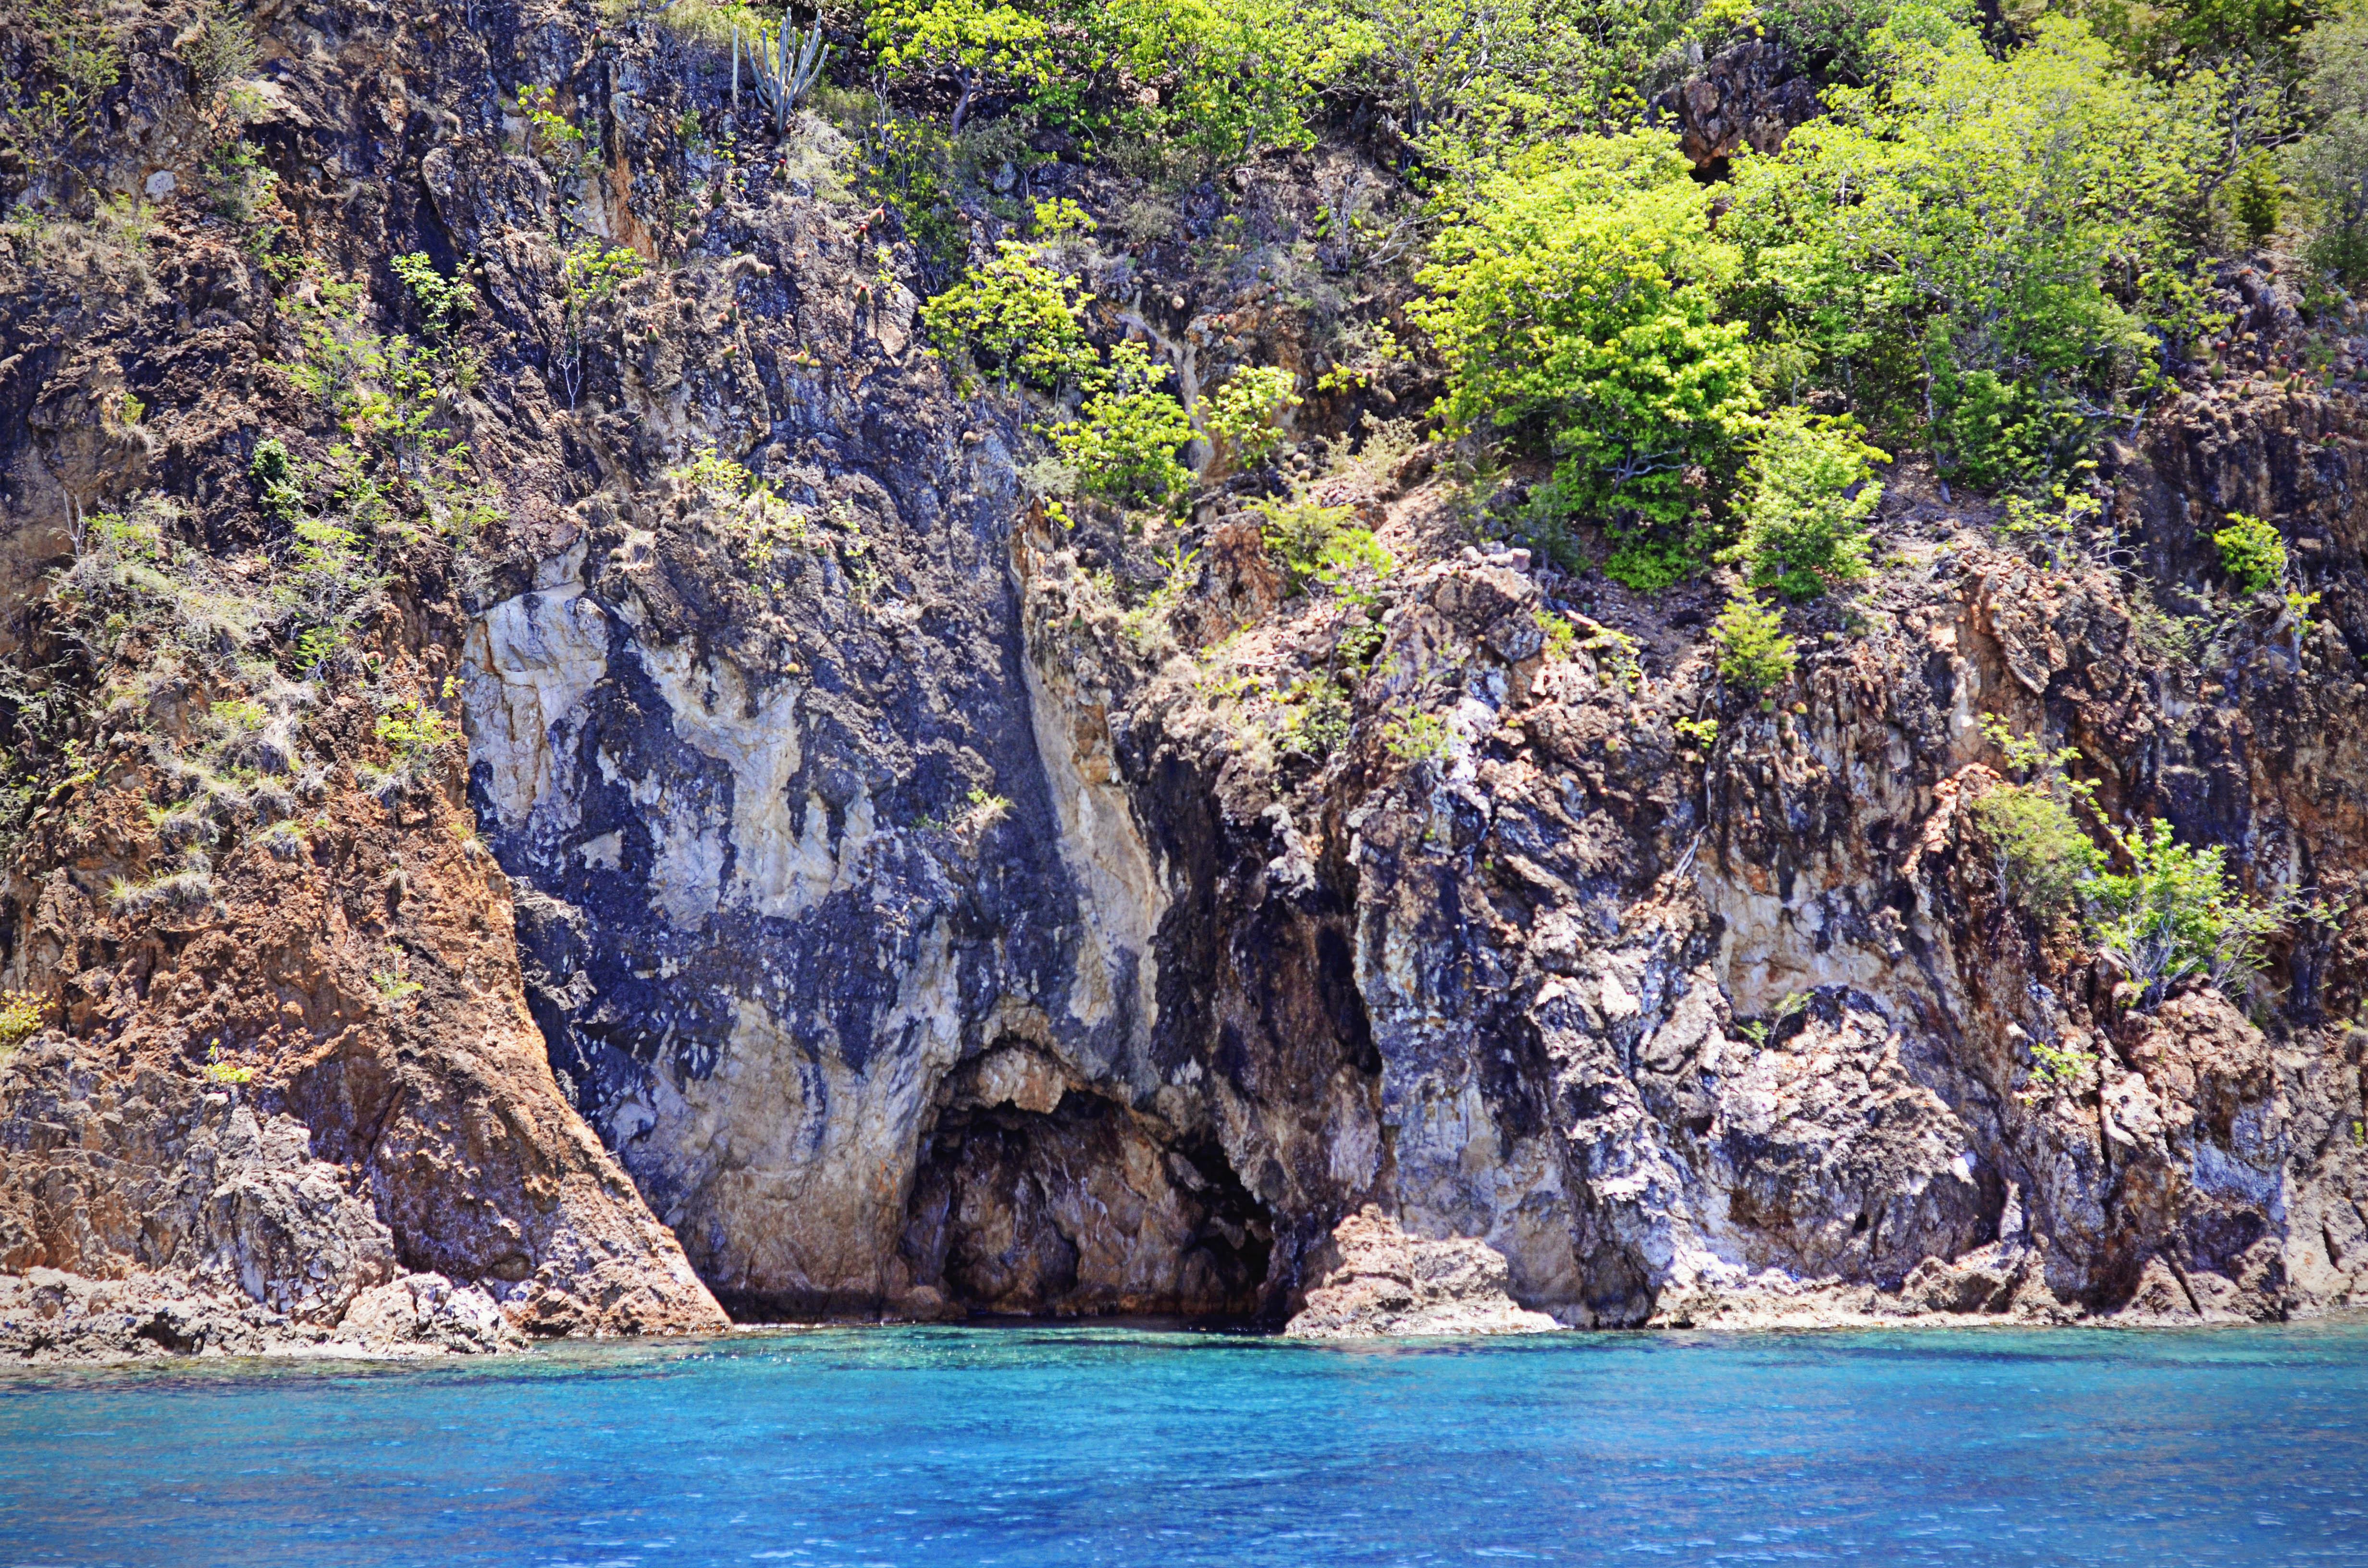 Norman Island caves | Sailing British Virgin Islands Itinerary | Hi Lovely